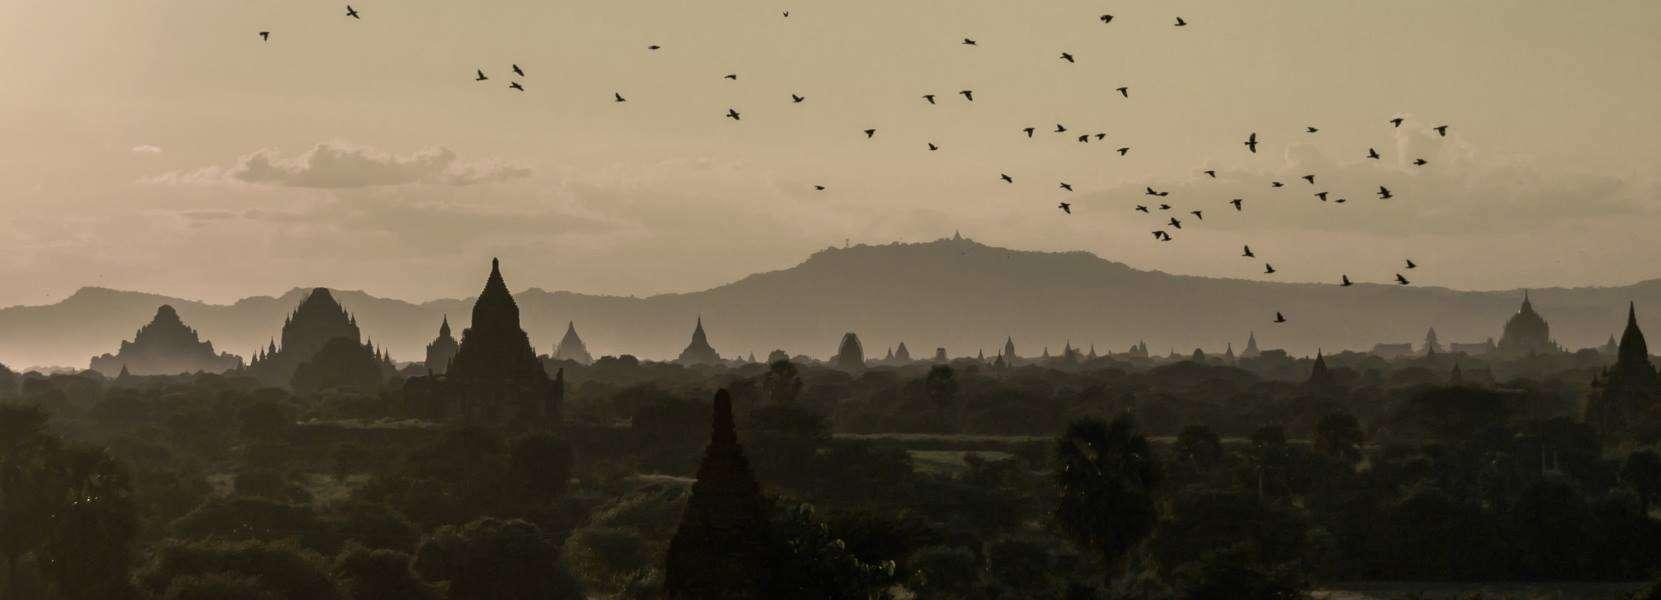 bagan myanmar birds